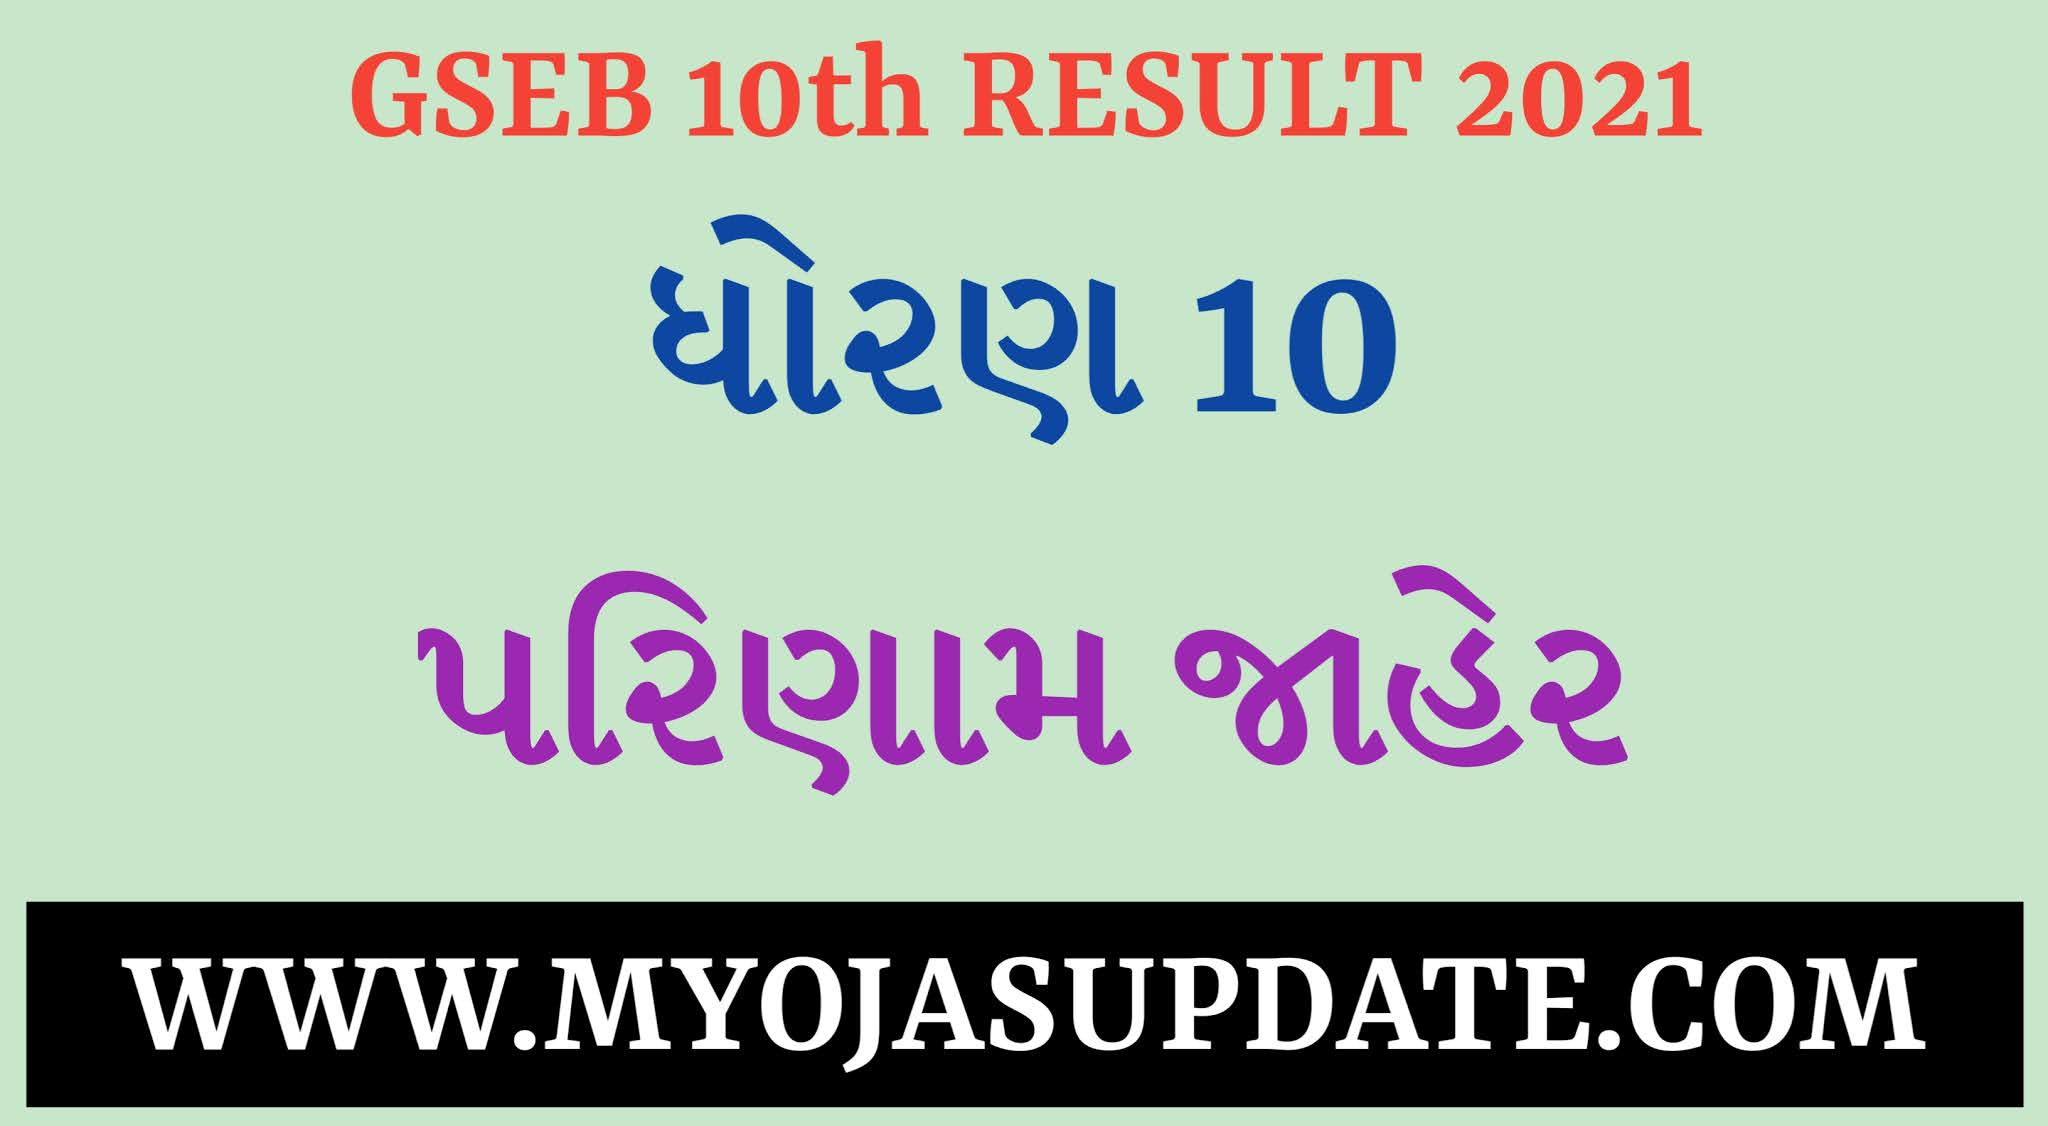 GSEB 10th Result 2021 | 10th Result 2021 | SSC 10th Result 2021 | SSC 10th Result 2021 Gujarat Board | SSC 10th Result Gujarat | SSC 10th Result Gujarat | SSC 10th Result GSEB | SSC 10th Result Date 2021 | SSC 10th Result Date | GSEB SSC 10th Result Date | GSEB 10th Result Date 2021 | GSEB 10th Result Date | SSC 10th Result Date 2021 | SSC 10th Result Date | Board Result 2021 | Board 10th Exam 2021 | Board 10th Result 2021 | Board 10th Result | Board Result Website | Gujarat Board Result | Gujarat Board Result 2021 | Gujarat Board Result Date 2021 | Gujarat Board Result | GSEB Result 2021 | @gseb.org | @gsebeservice.com | GSEB SSC Result 2021 | GSEB SSC Result 2021 Gujarat Board | ssc result 2021 | ssc result 2020 | 10th result 2021 | 10th result 2020 | std 10th result 2021 gujarat board | std 10th result 2020 gujarat board | gseb ssc result 2020 | gseb ssc result 2021 | gseb ssc result 2020 | gujarat ssc result 2020 | gujarat ssc result 2021 | gipl result 2020 | gipl result 2021 | gipl ssc result | gipl ssc result 2020 | gipl ssc result 2021 | gipl result 2021 10th | gipl result 2021 date | gipl result 2021 gujarat | gujarat gipl board result 2020 | gujarat gipl board result 2021 | gujarat gipl result 2020 | gujarat gipl result 2021 | std 10th result date 2021 | std 10th result date 2021 gujarat | gujarat board 10th result date | gujarat ssc result date | gujarat ssc result date 2021 | gseb ssc result date | gseb 10th result date